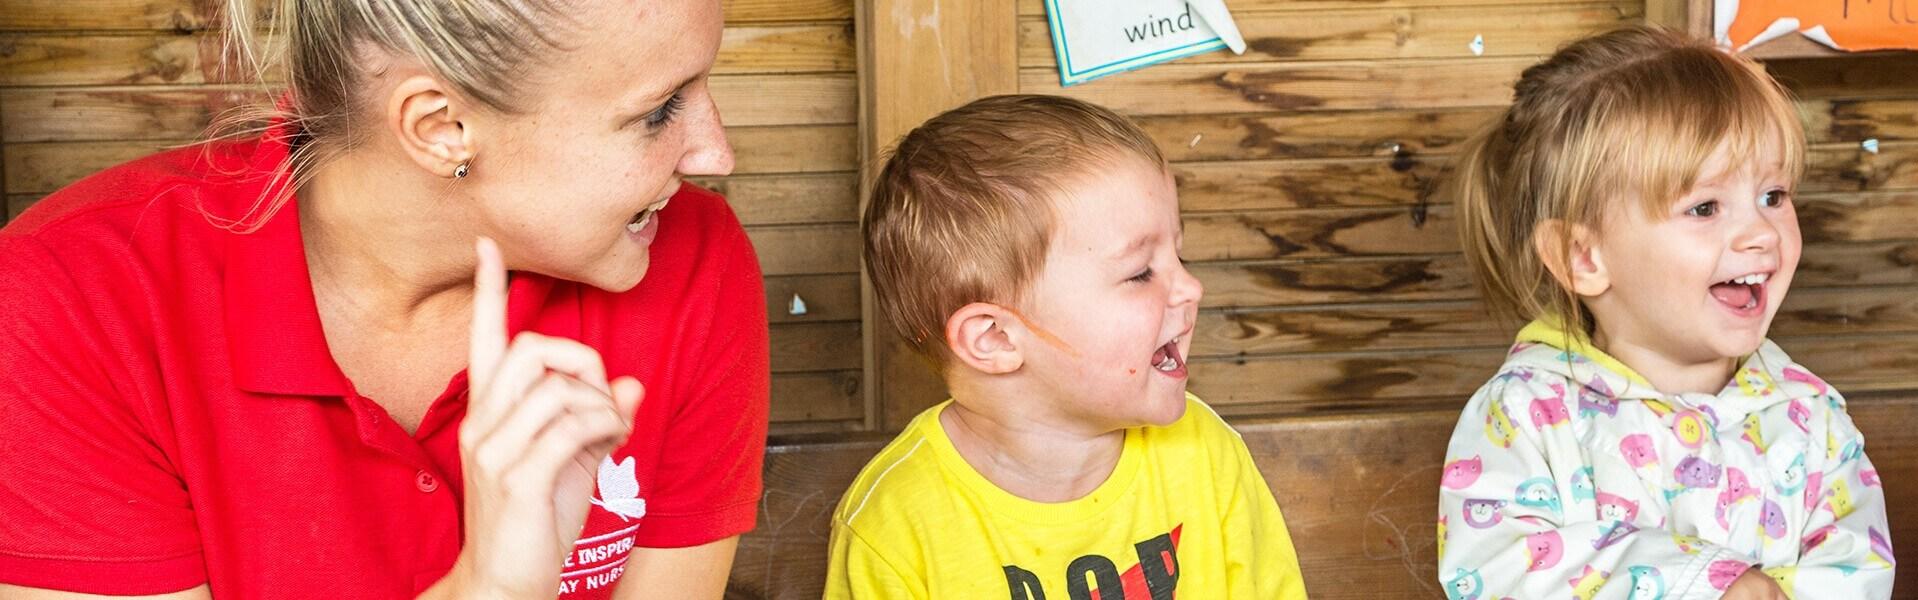 Little Inspirations ChildCare Llantrisant Nursery